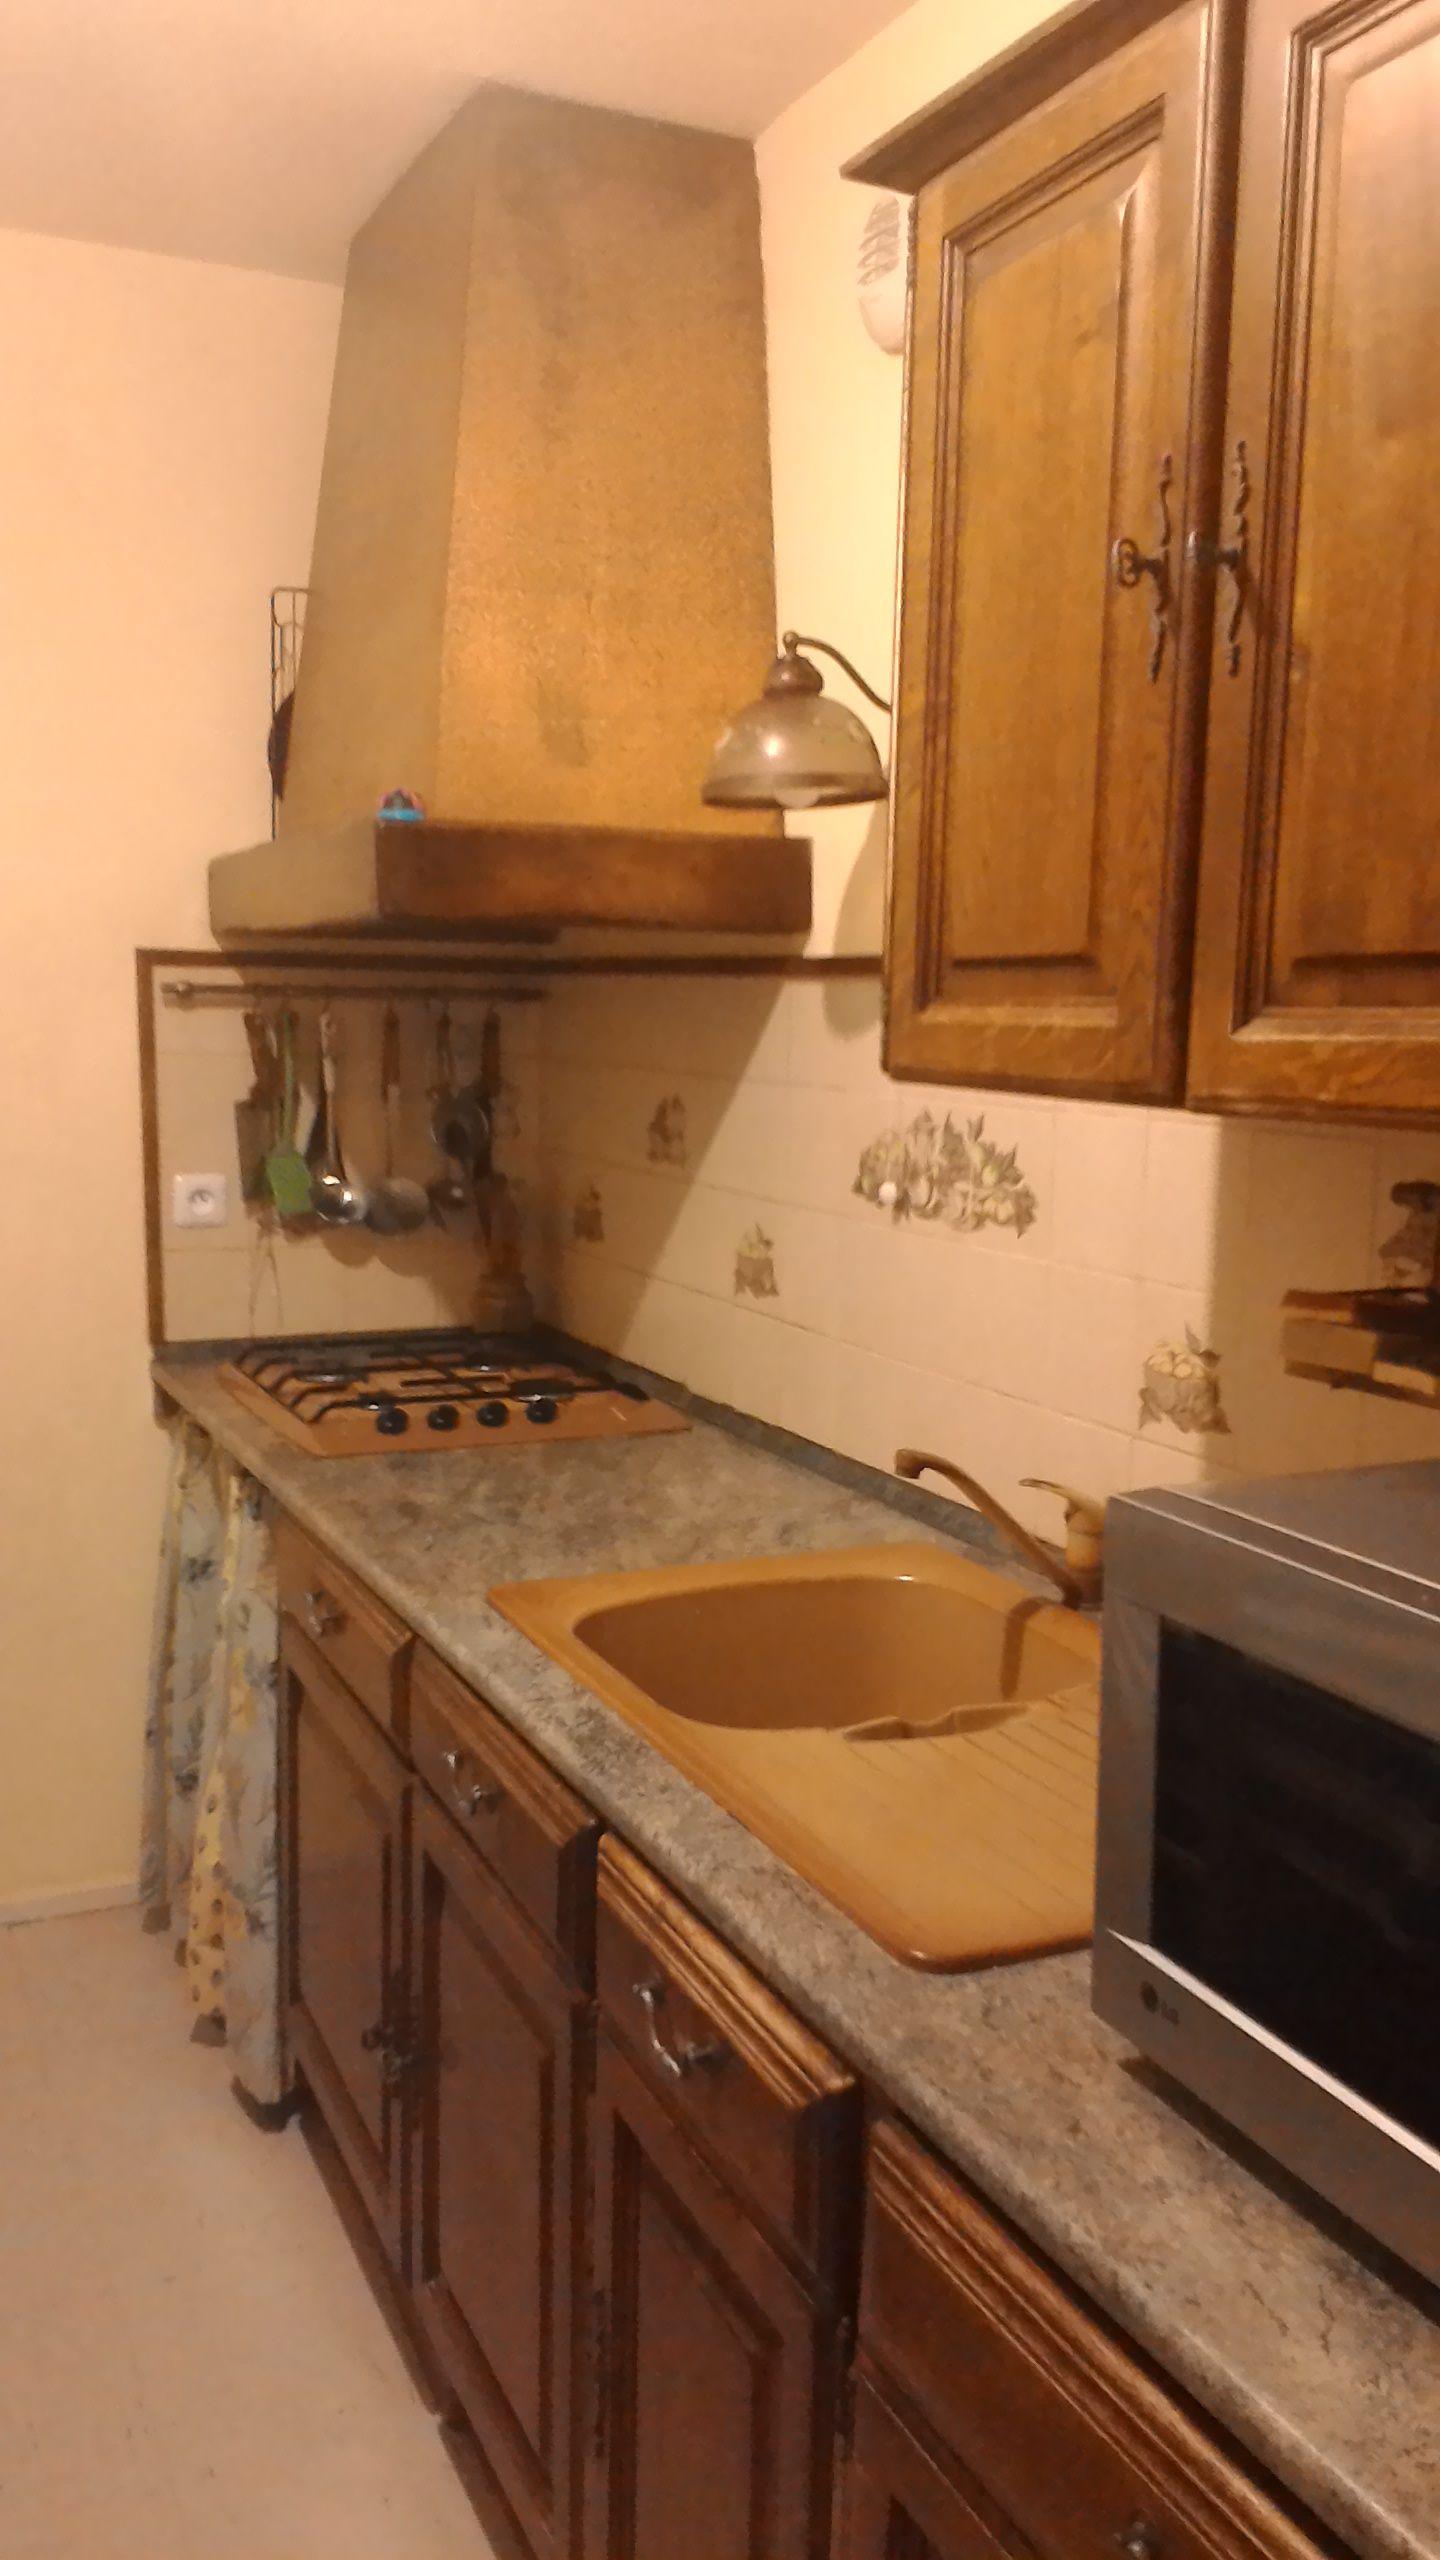 Achetez Cuisine Rustique Occasion Annonce Vente à Irigny - Vogica cuisine